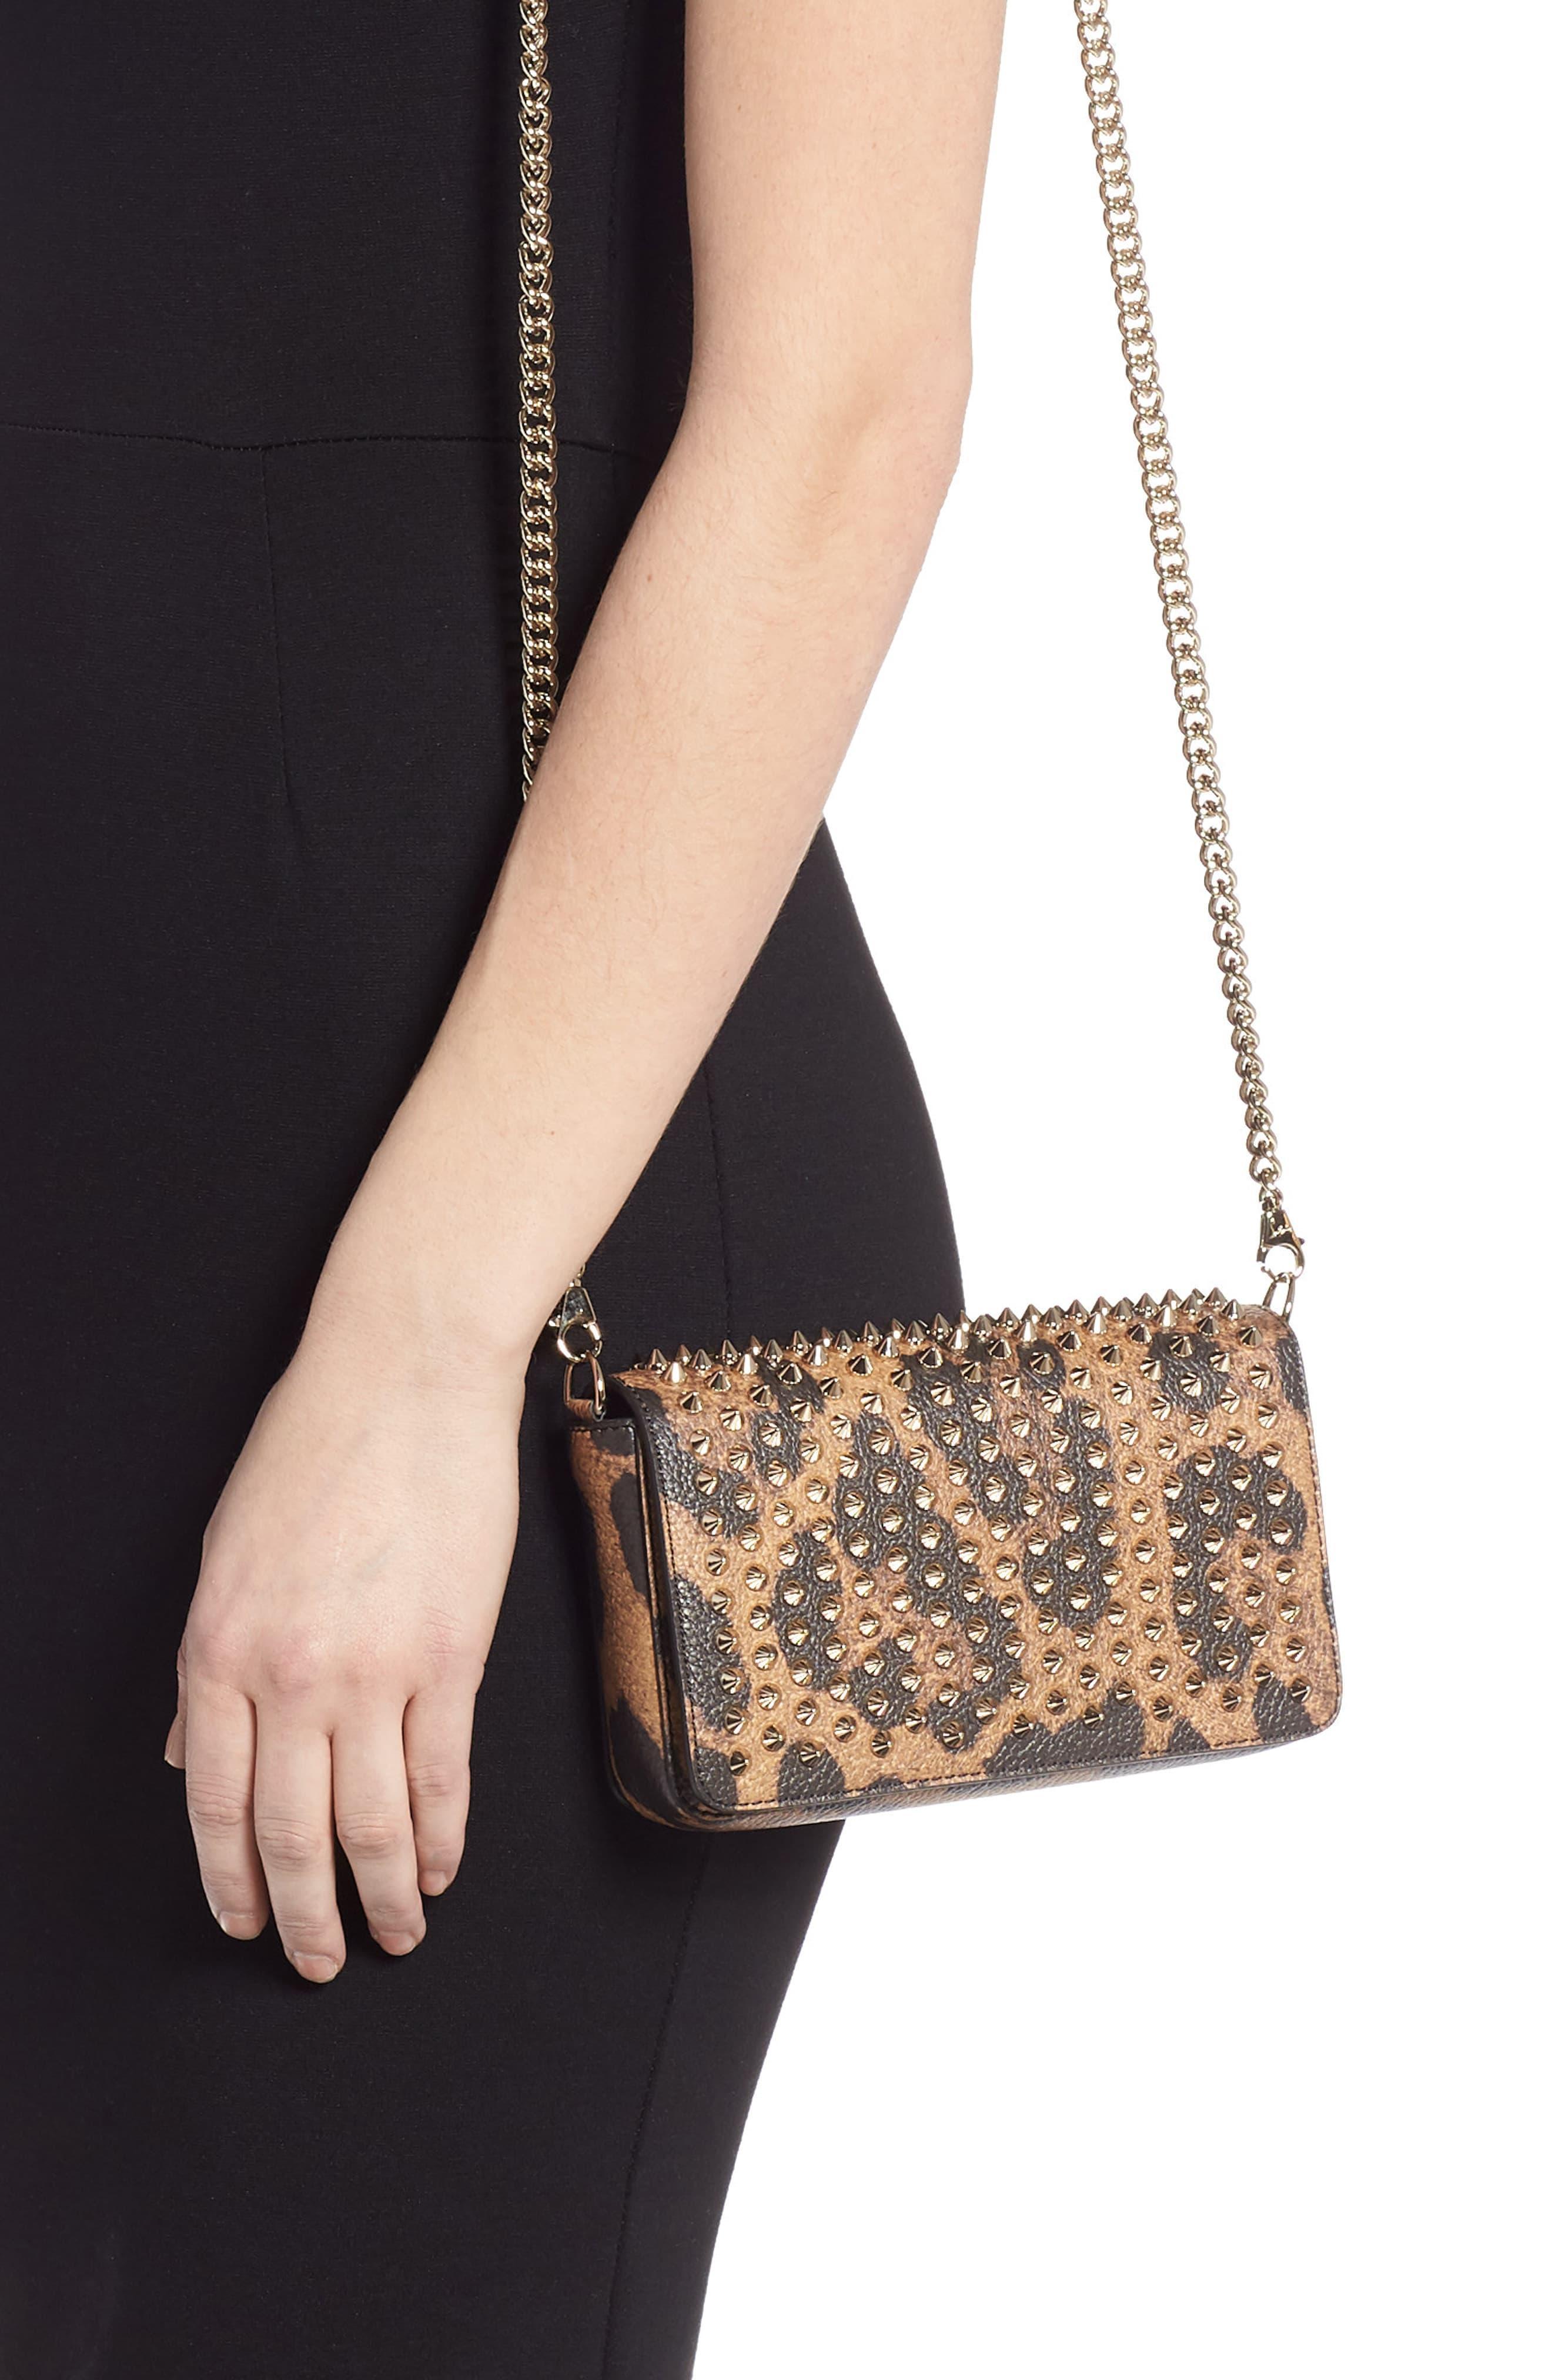 6ca2cc36966 Women's Zoompouch Leopard Print Leather Clutch